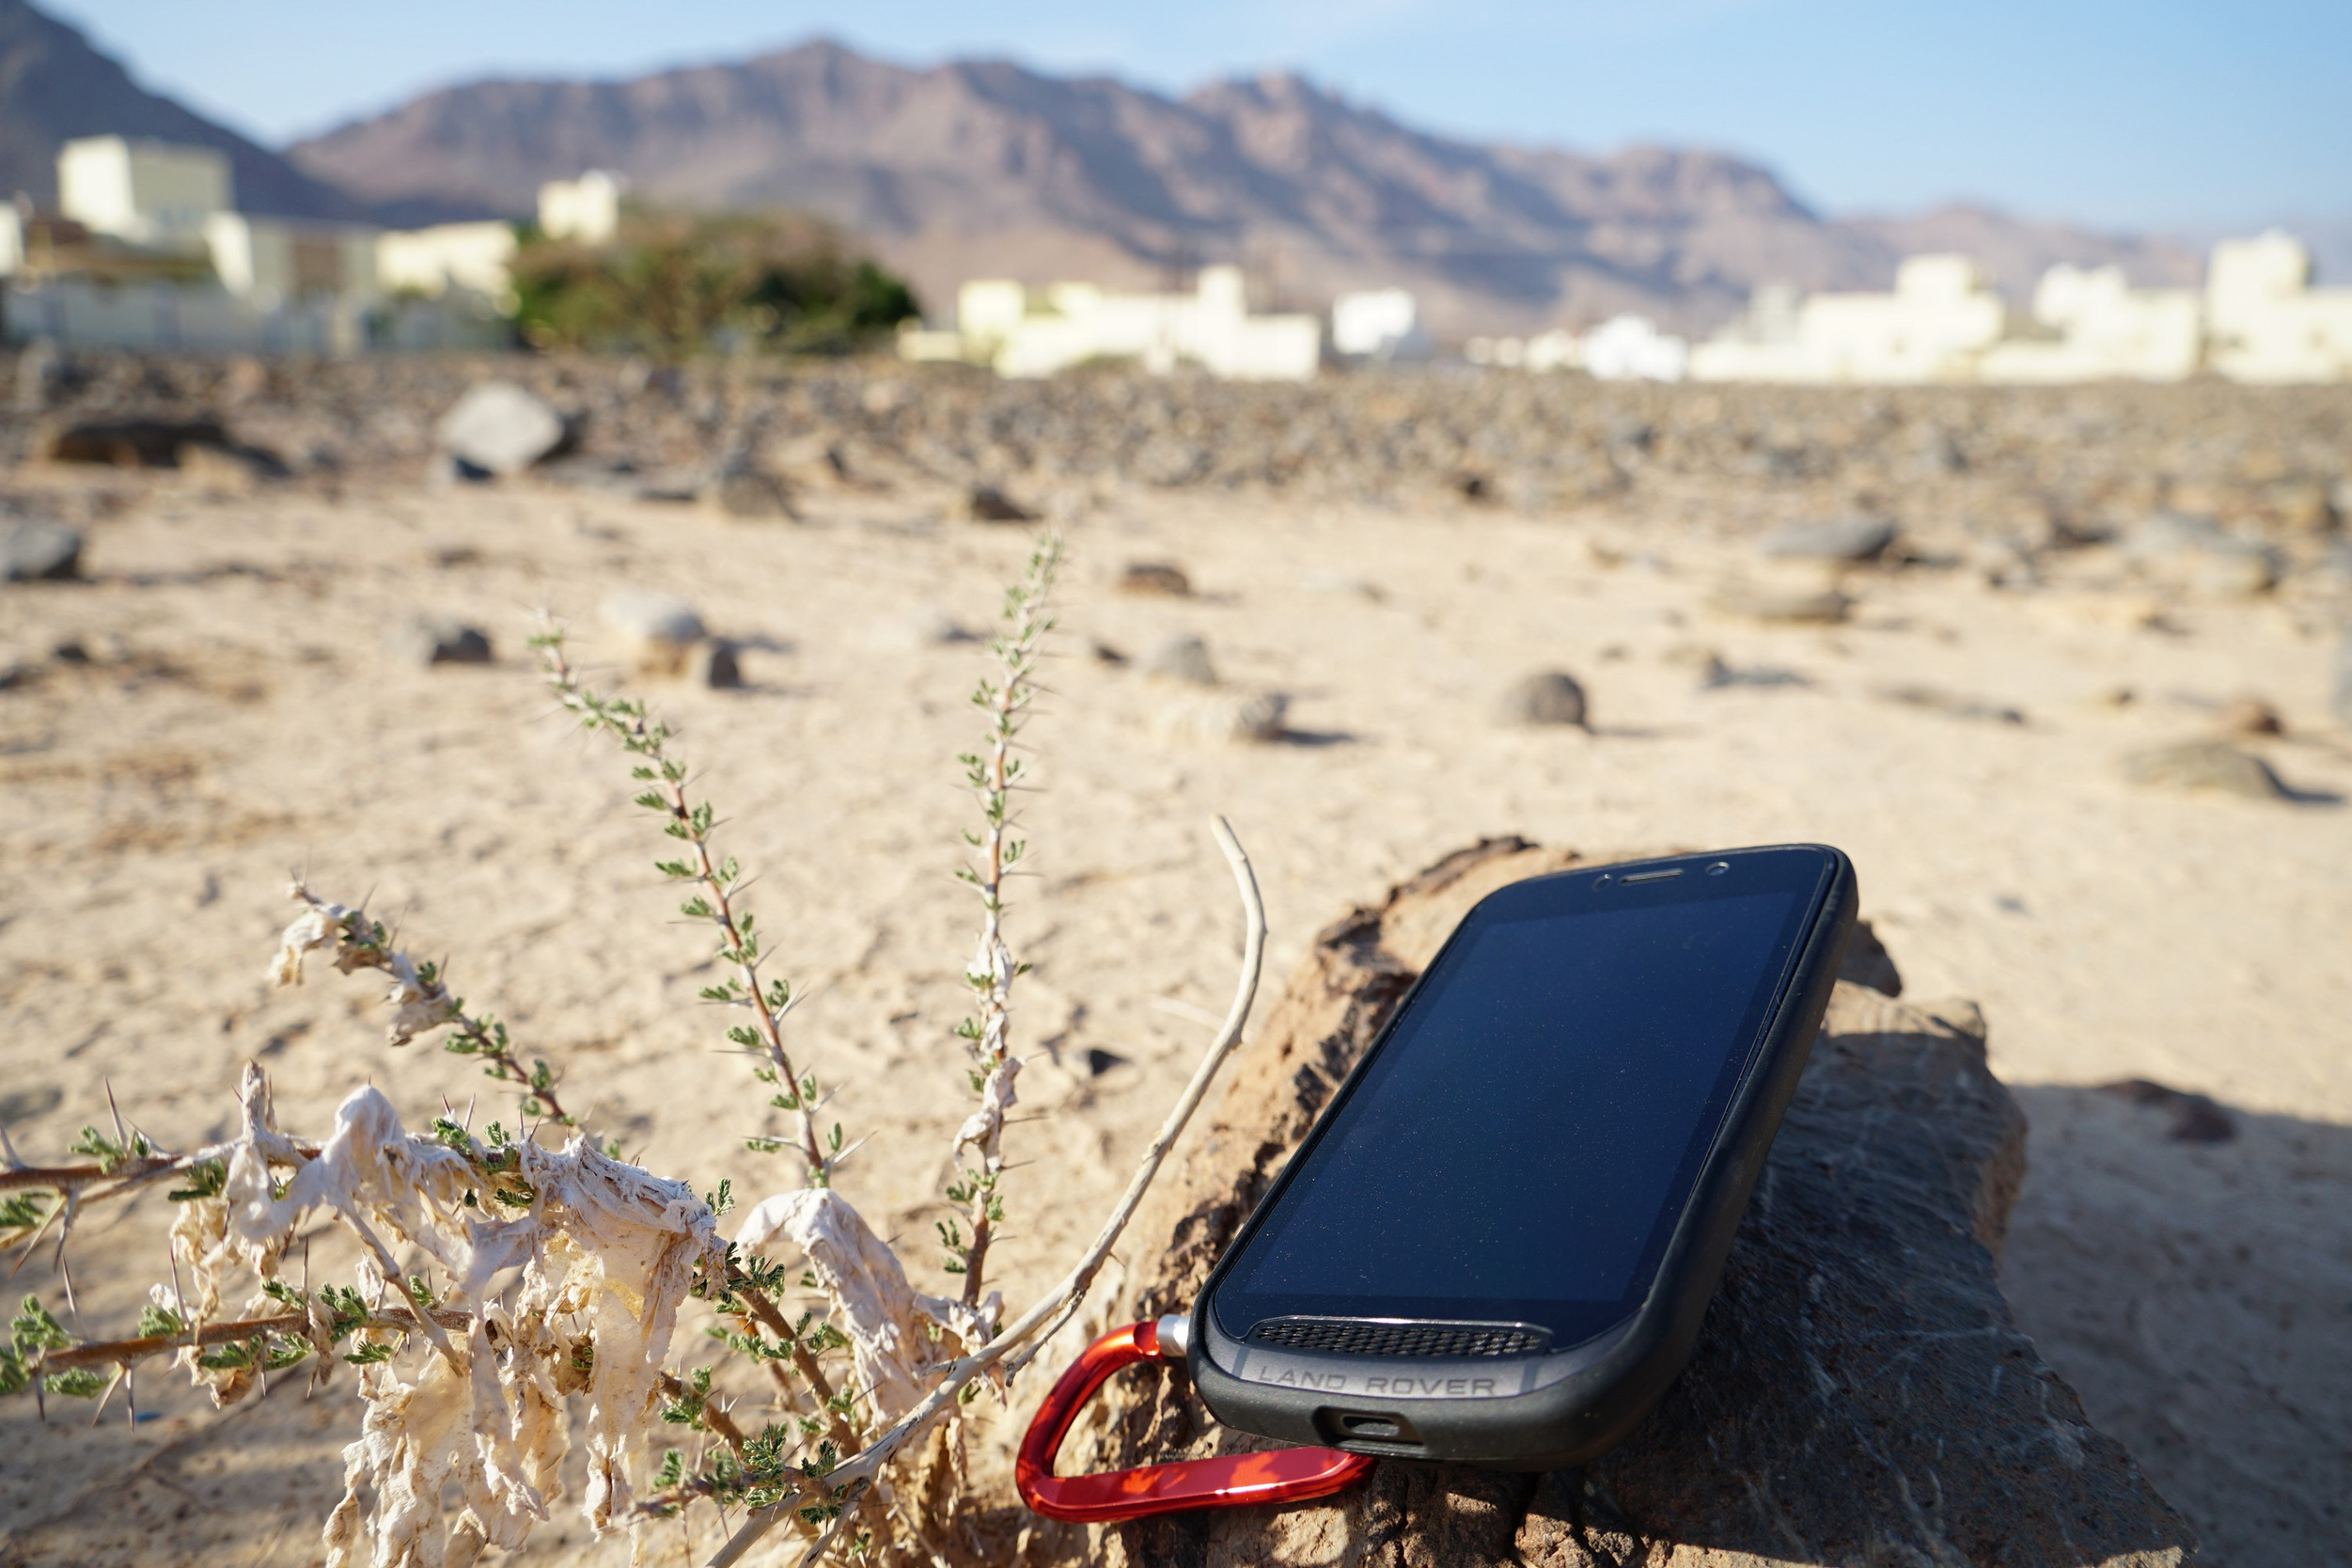 The Explore phone in the hot Oman sunshine | Land Rover Explore